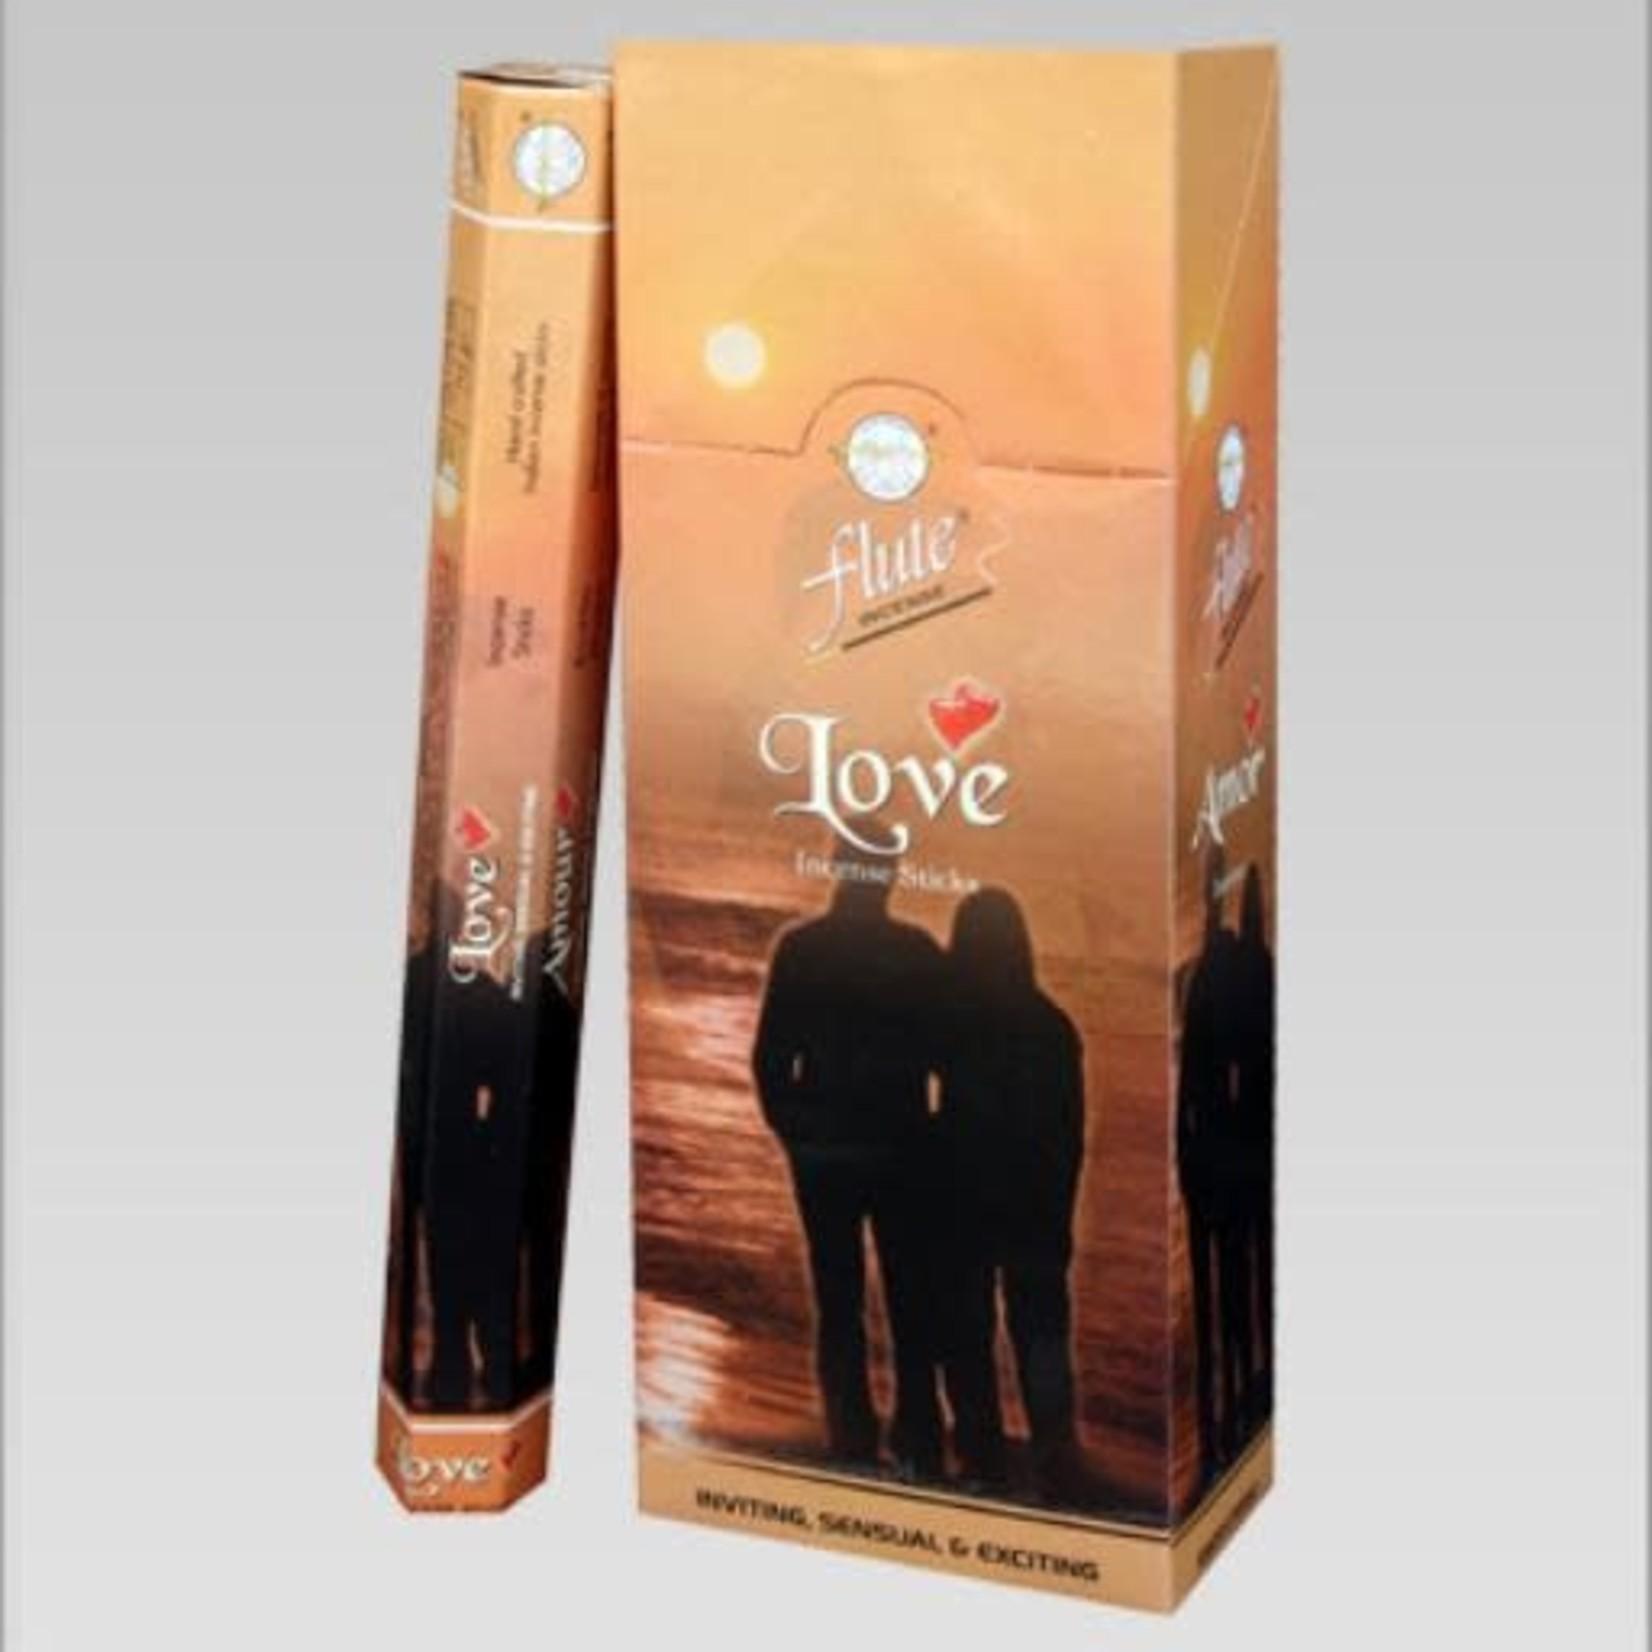 FLUTE Love Incense Stick - Flute